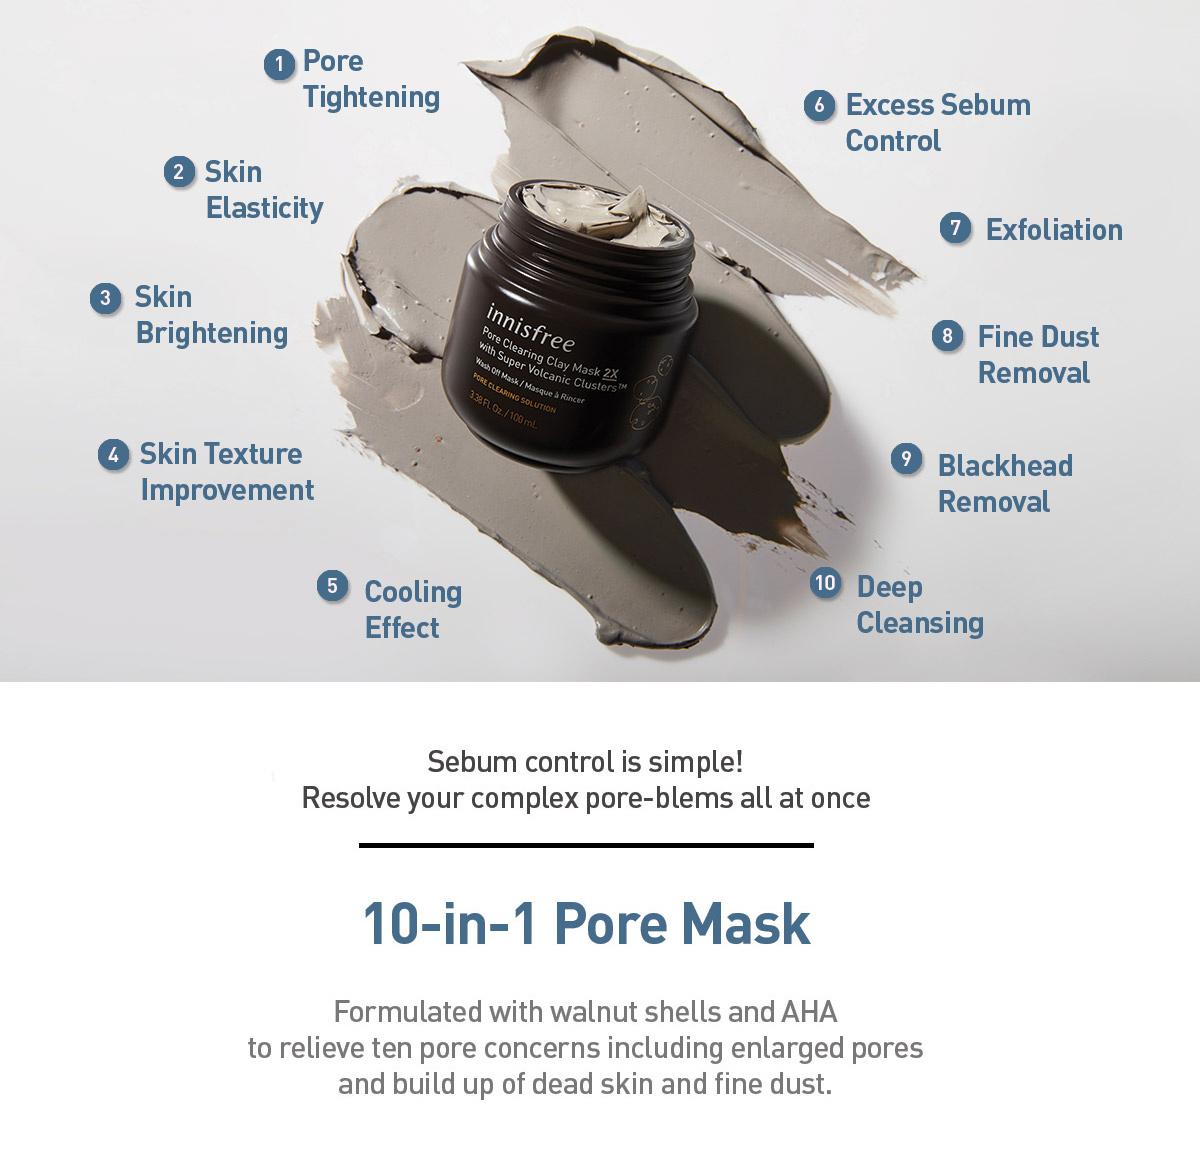 Super Volcanic Pore Clay Mask 2X-4